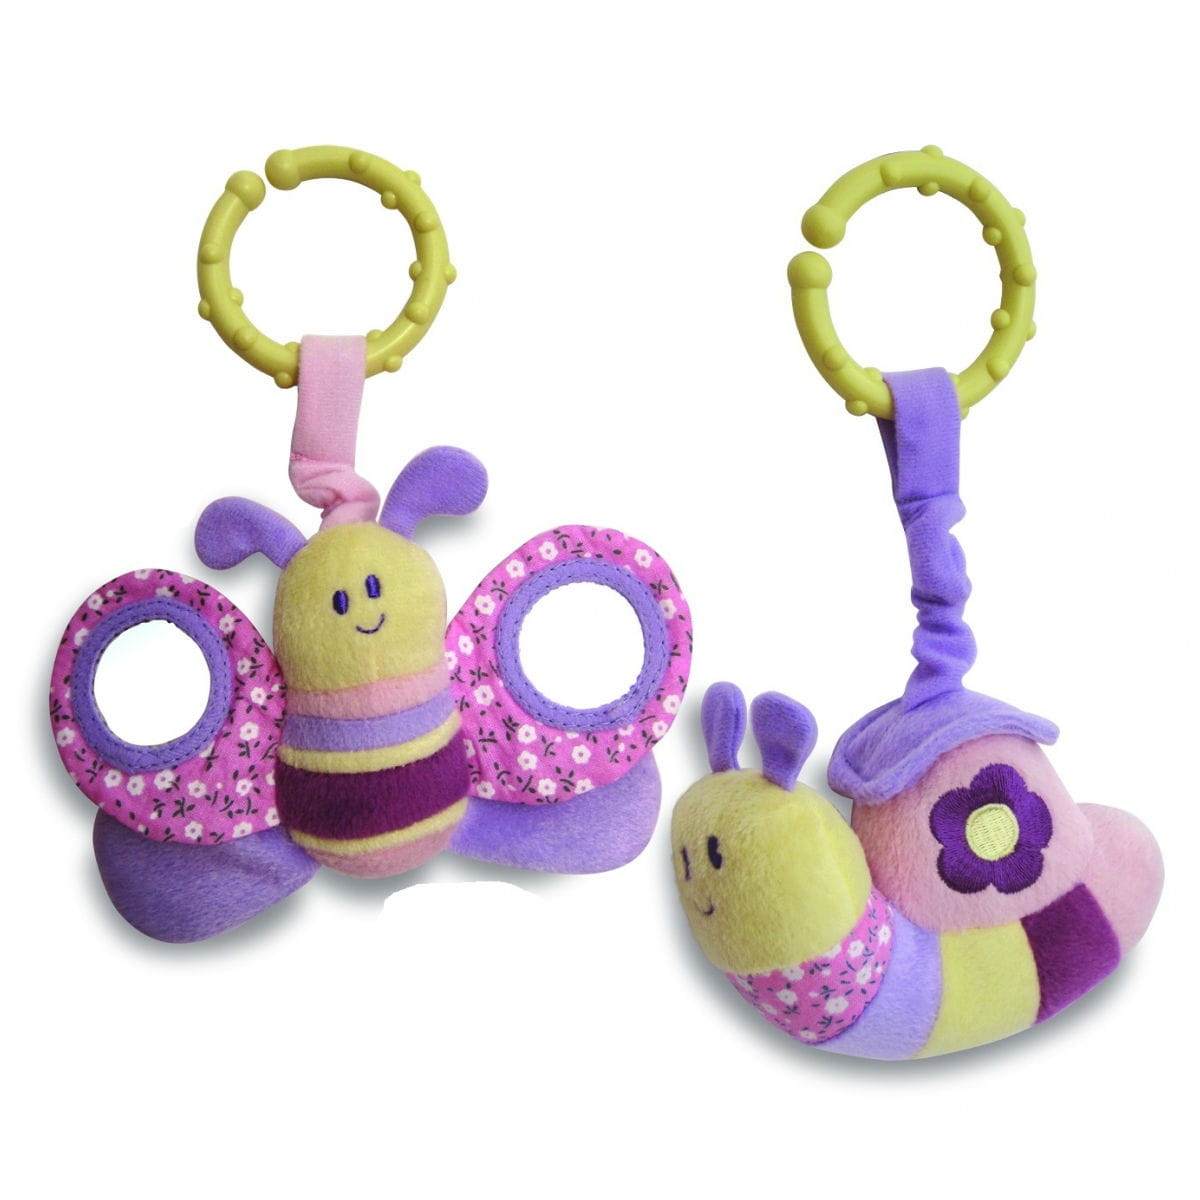 Мягкая игрушка - подвеска LITTLE BIRD TOLD ME Бабочка и улитка